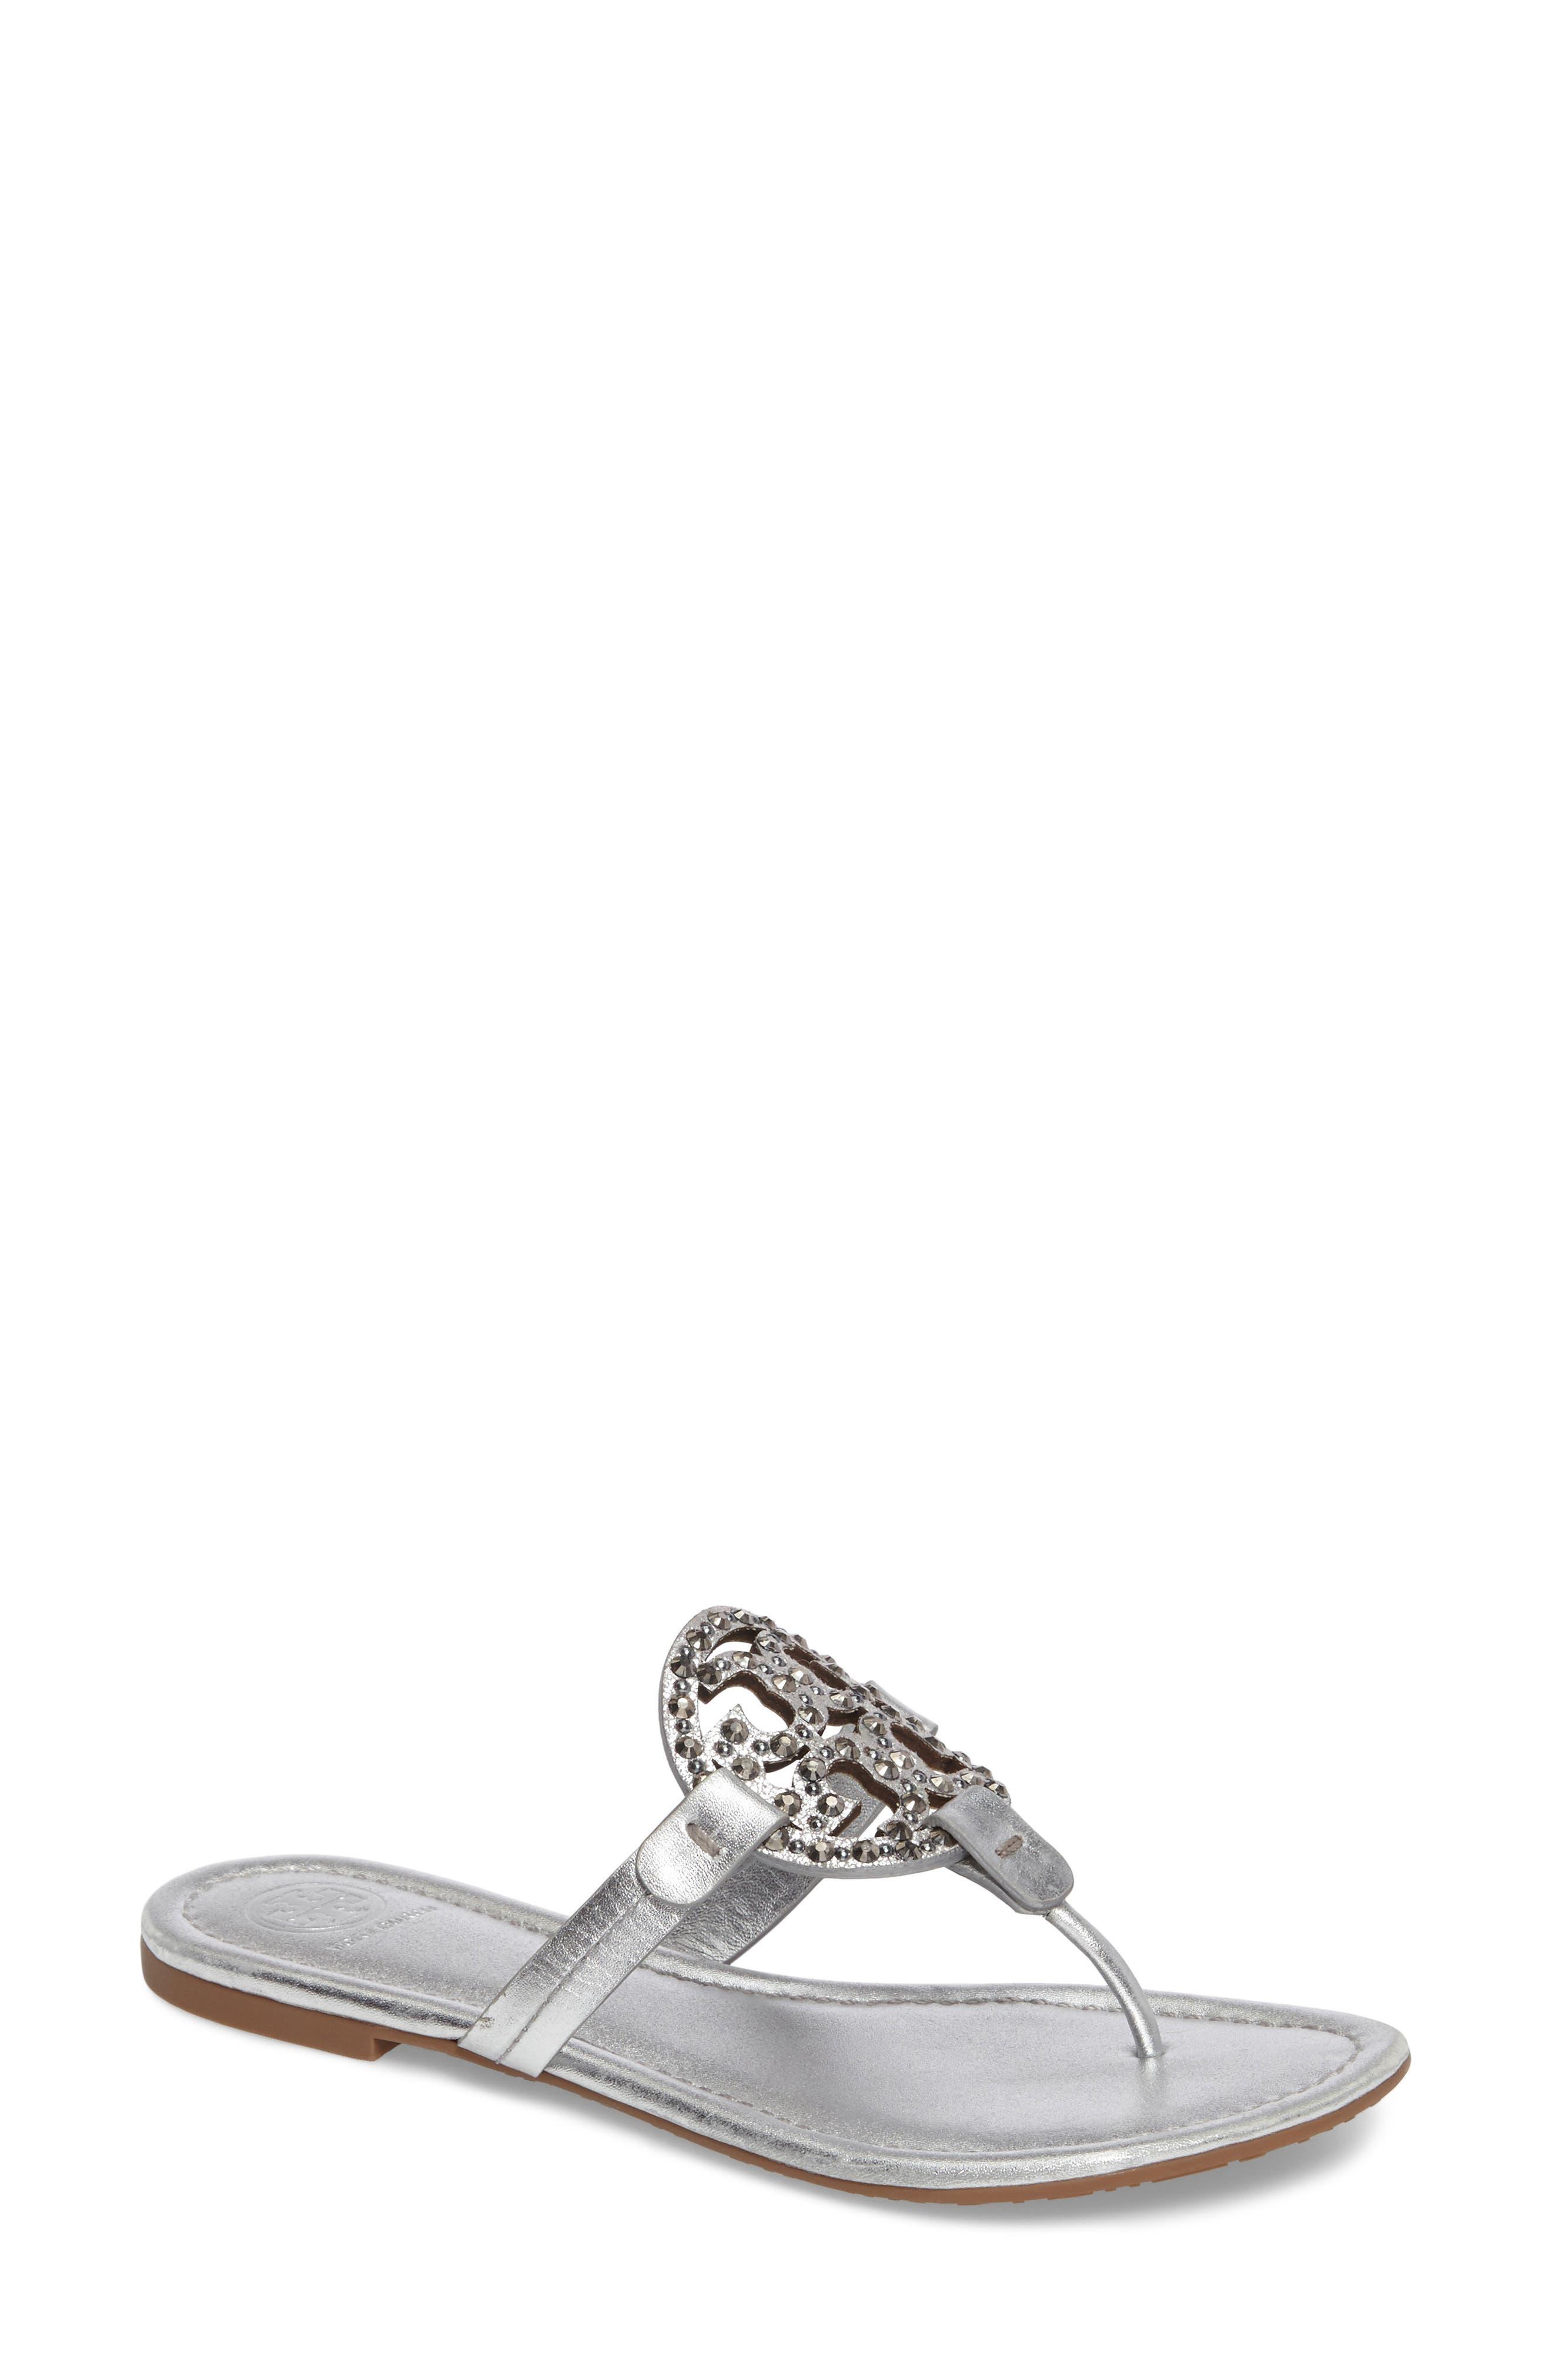 Main Image - Tory Burch Miller Embellished Sandal (Women)